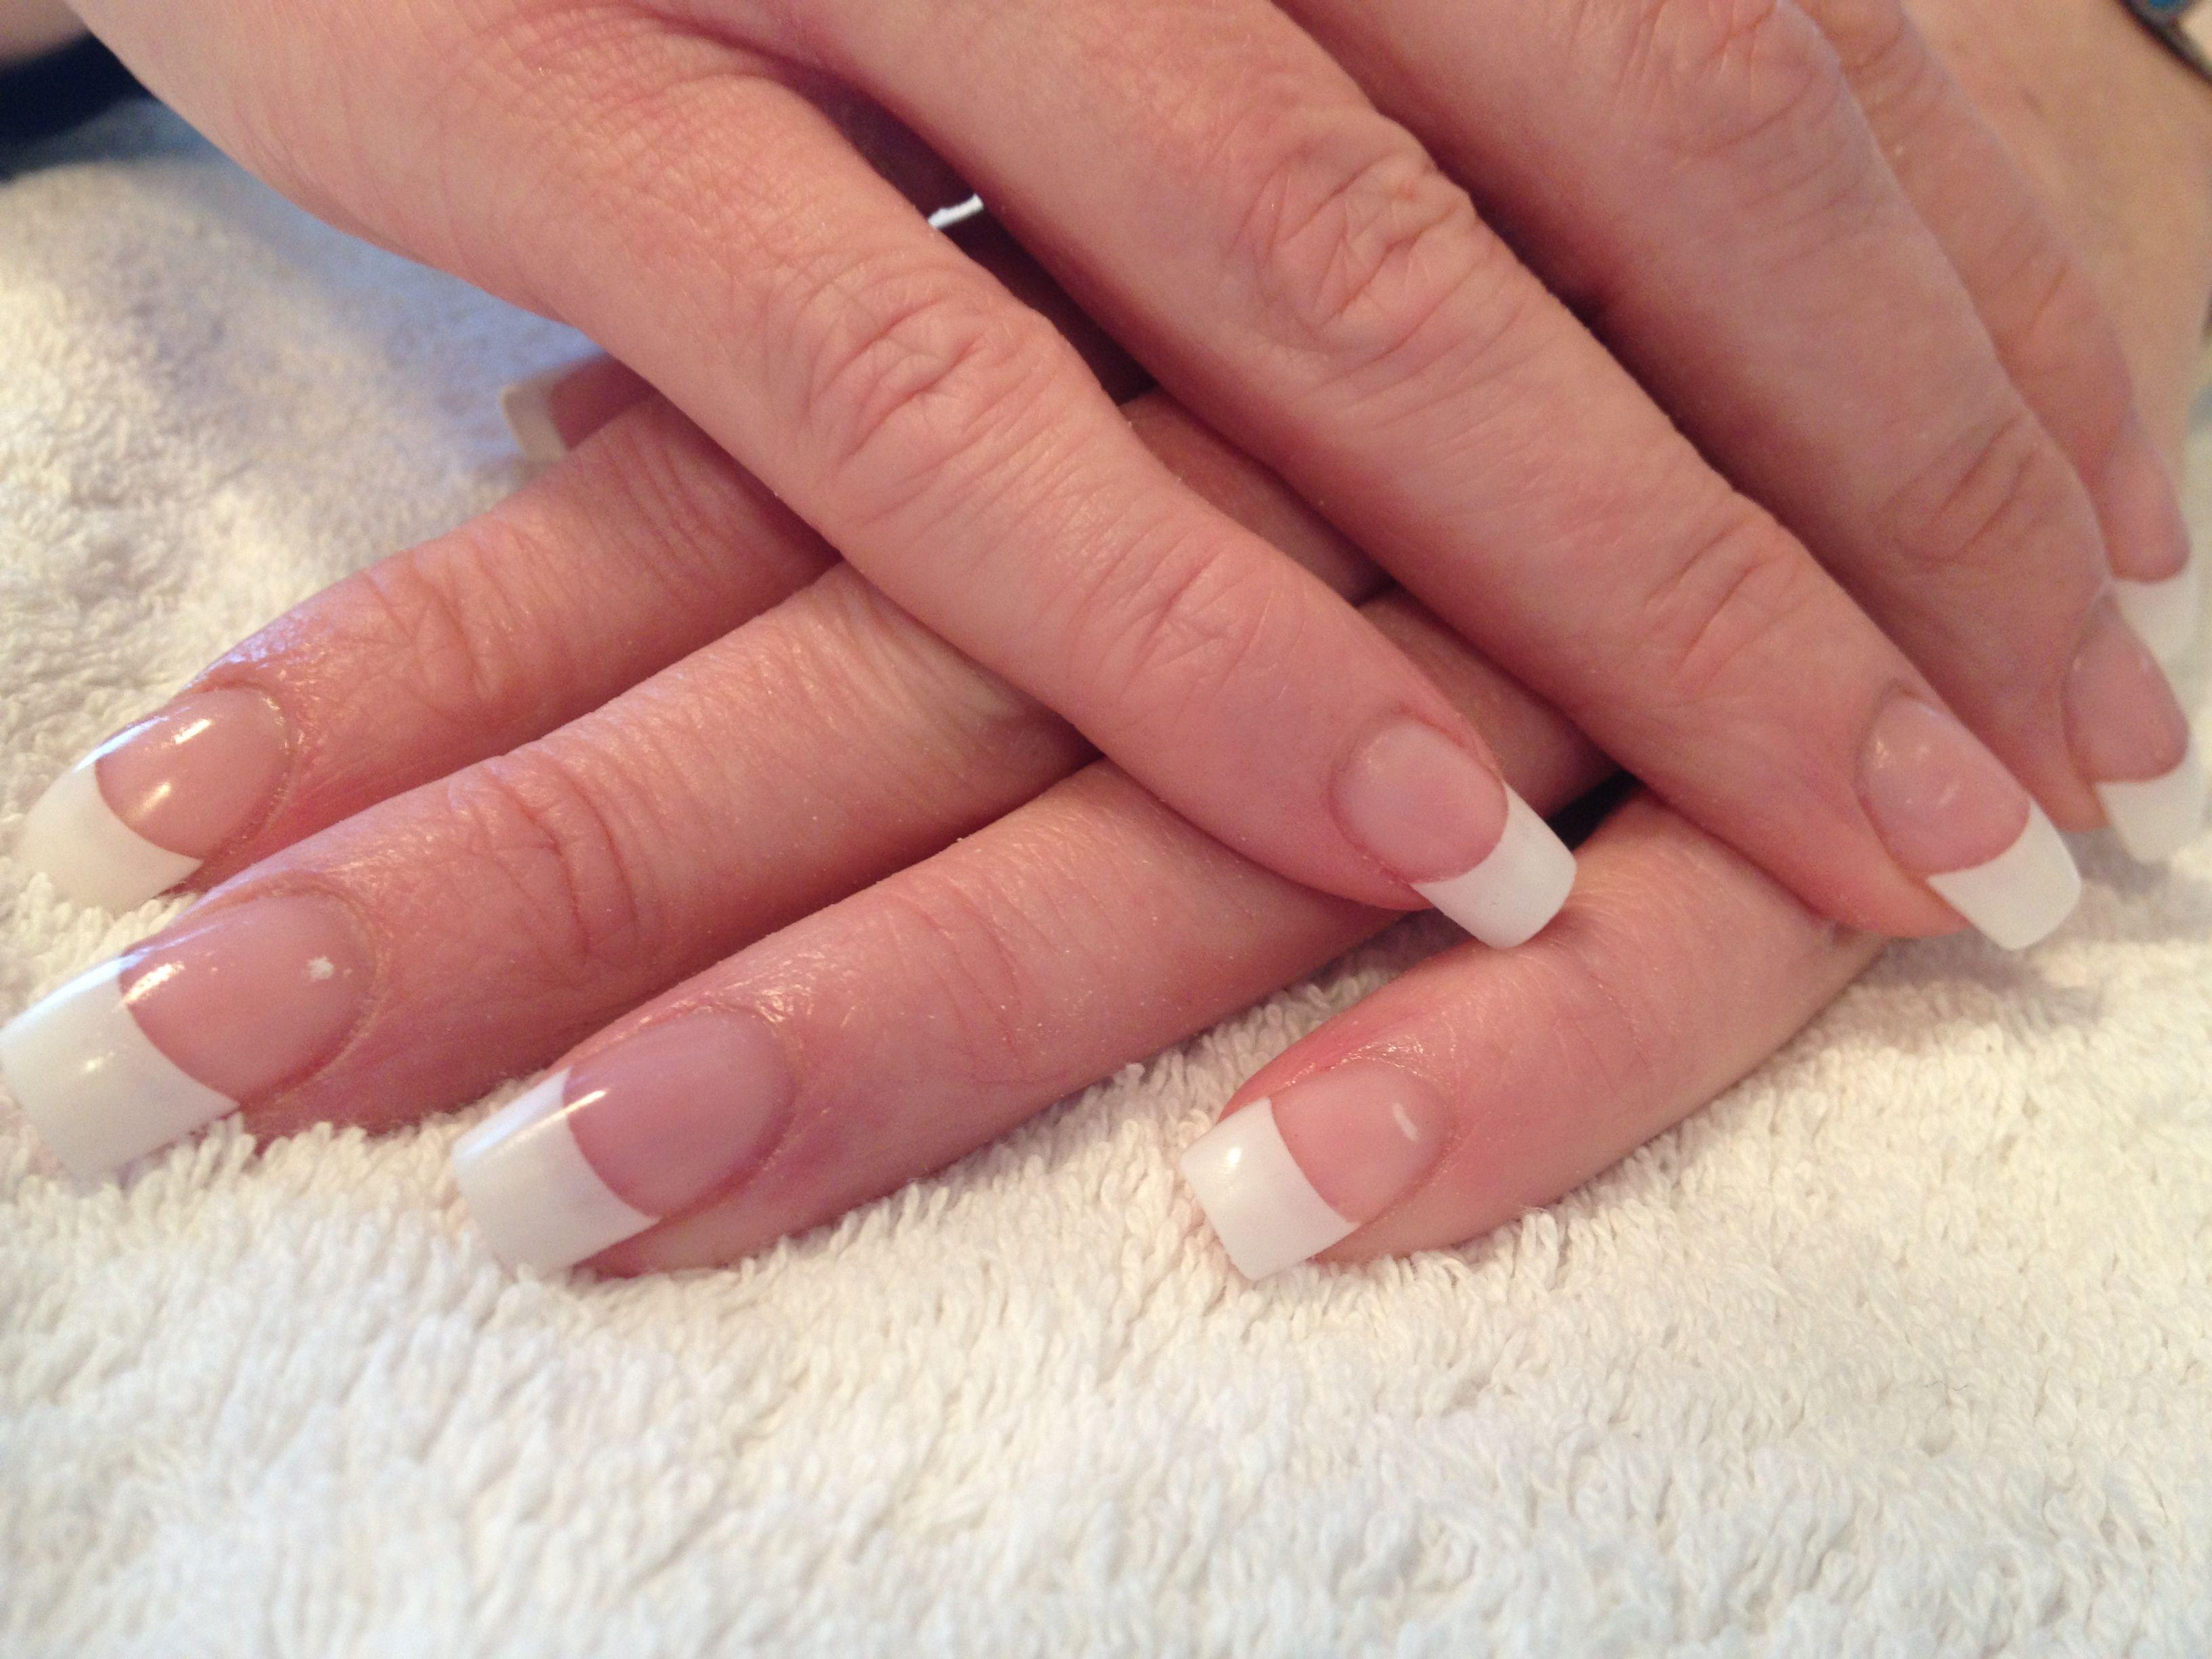 French white tip acrylic nails | Polished nail | Pinterest